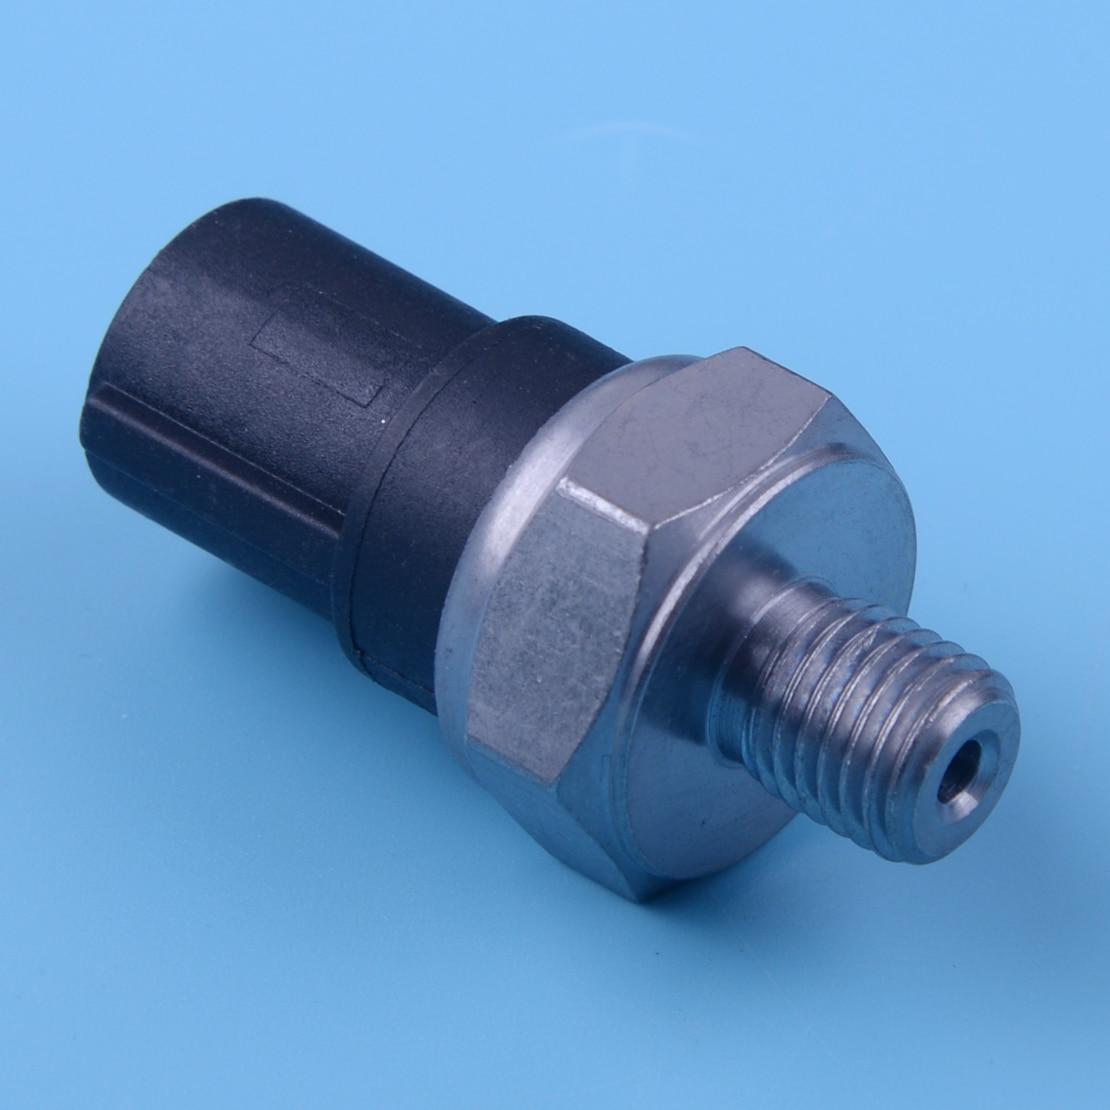 CITALL 2 Pin Oil Pressure Switch Sensor 37250PNEG01 VTEC